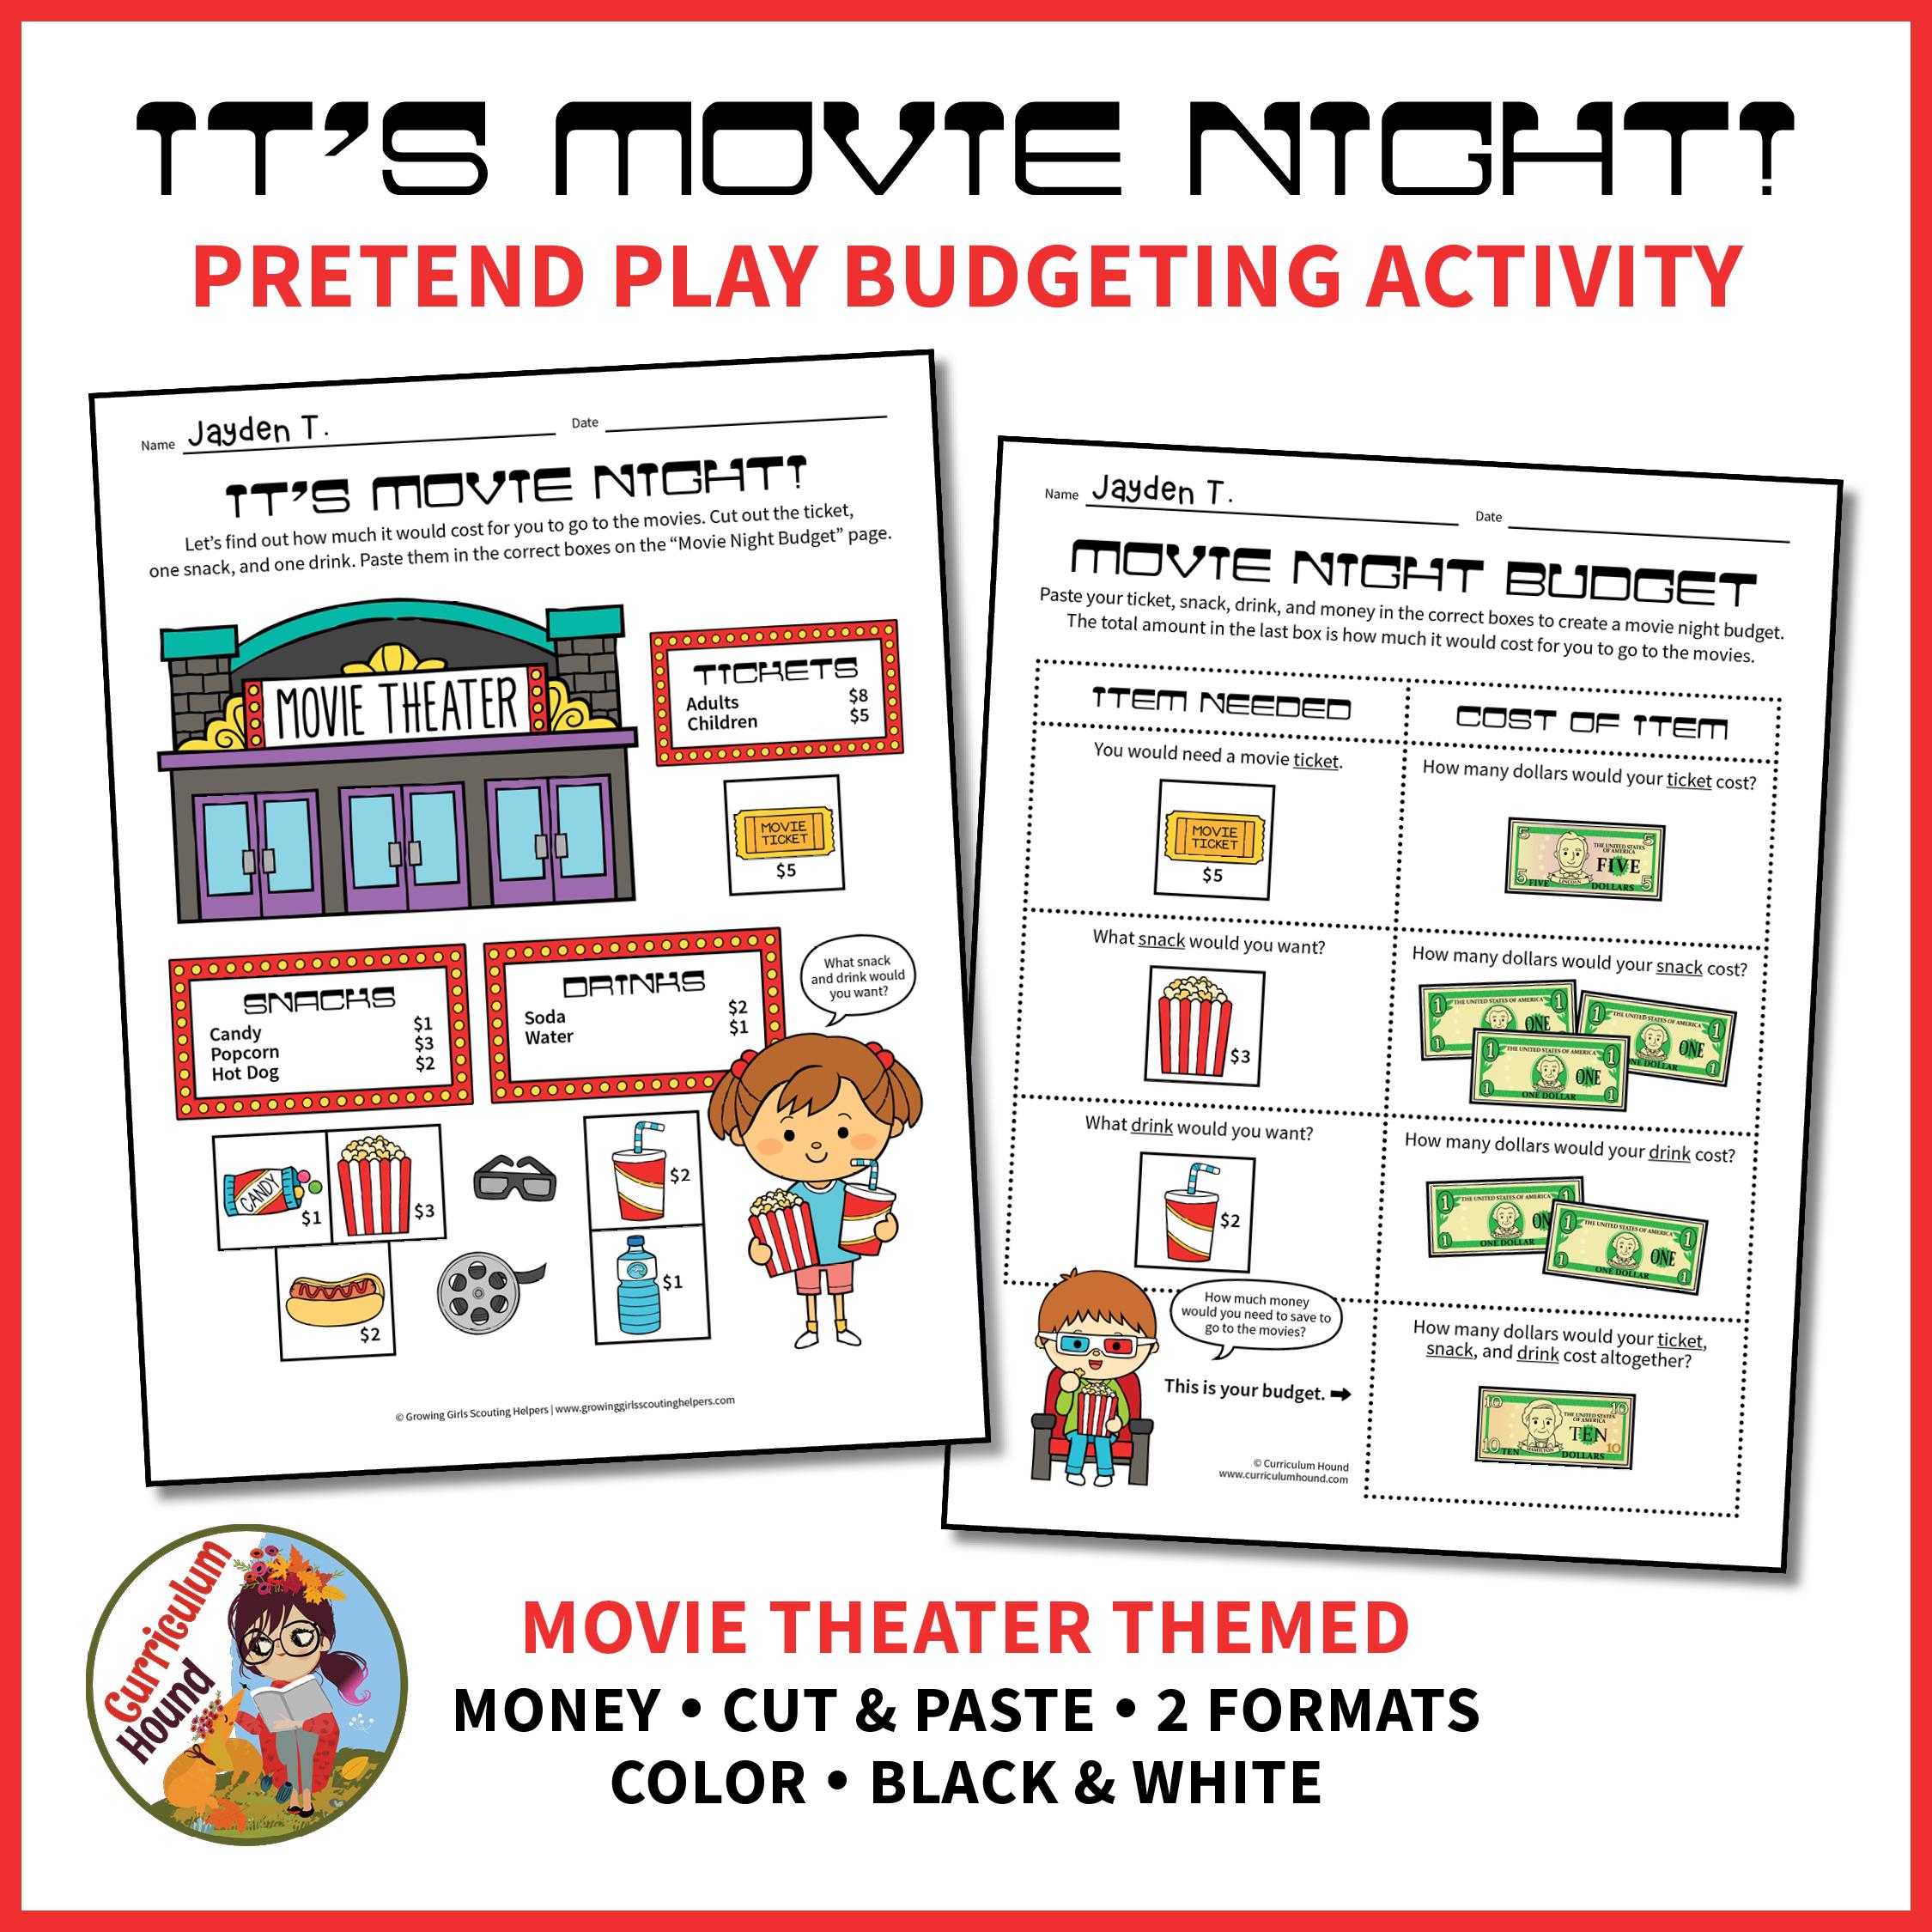 Movie Theater Budgeting Activity